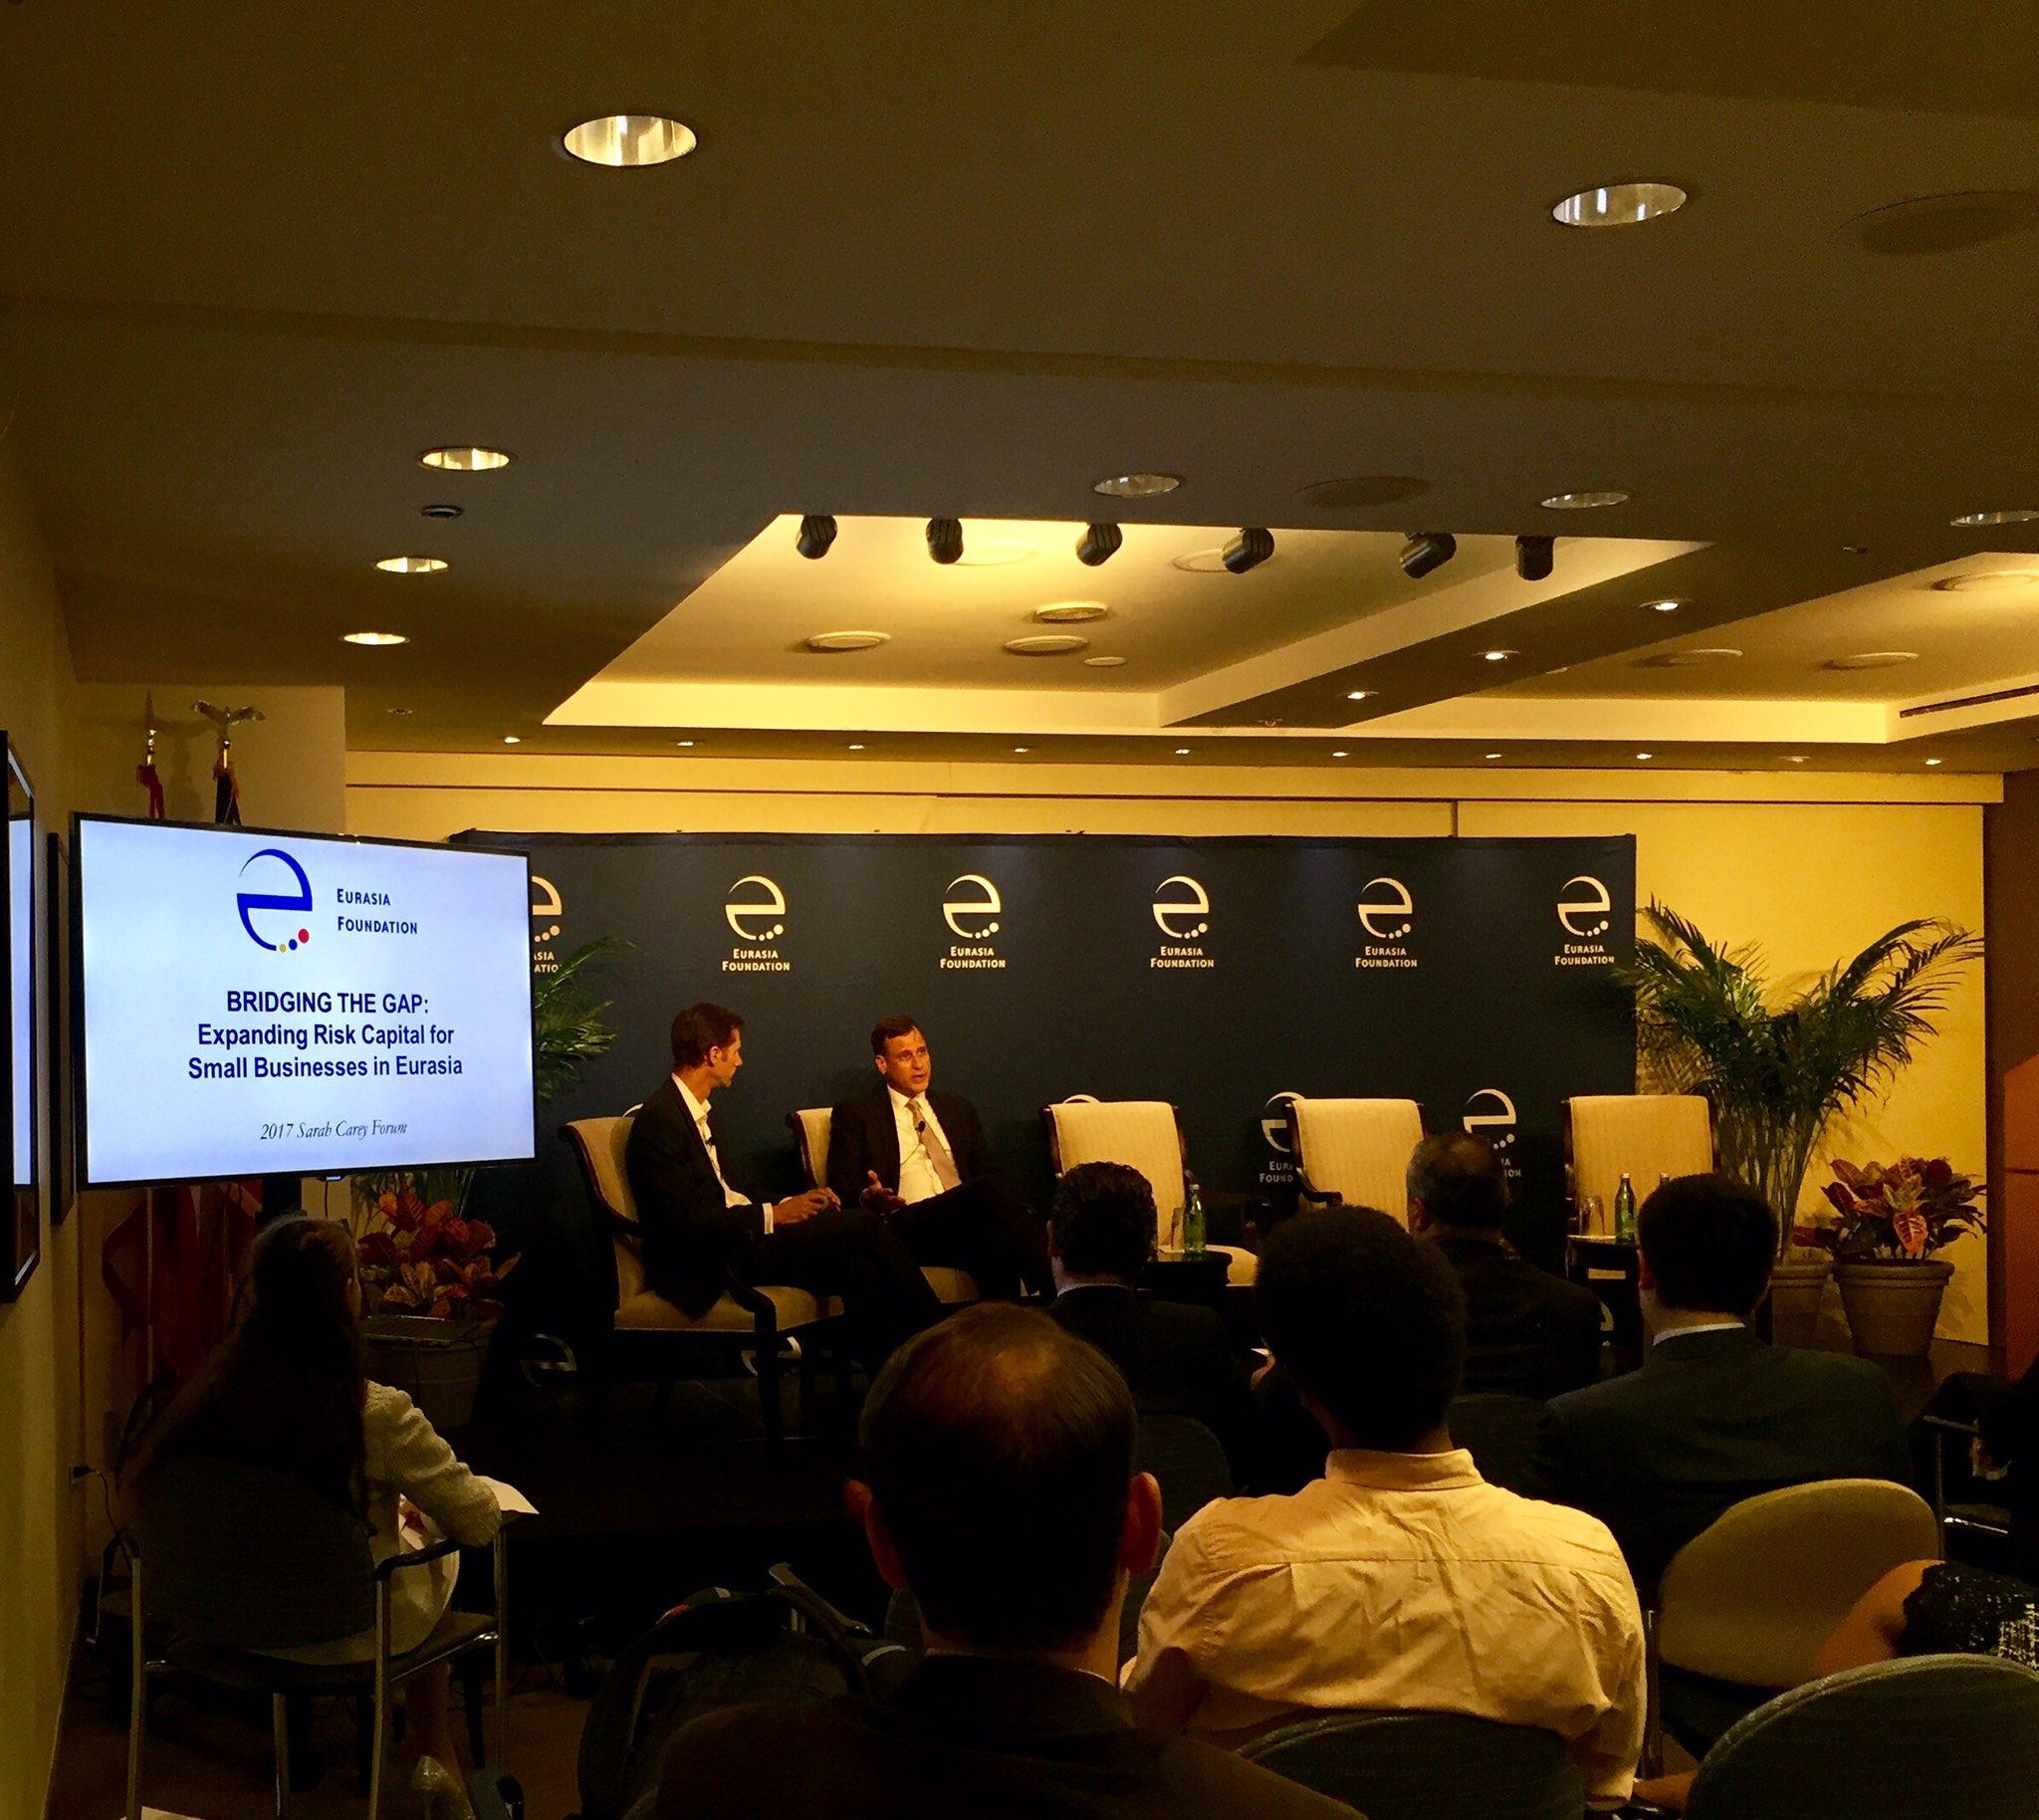 WSJ's Dan Keeler and OPIC's John Didiuk discussing #impactinvesting & #EmergingMarkets at @EFNetwork #EFImpInv https://t.co/elNQSfZxGn